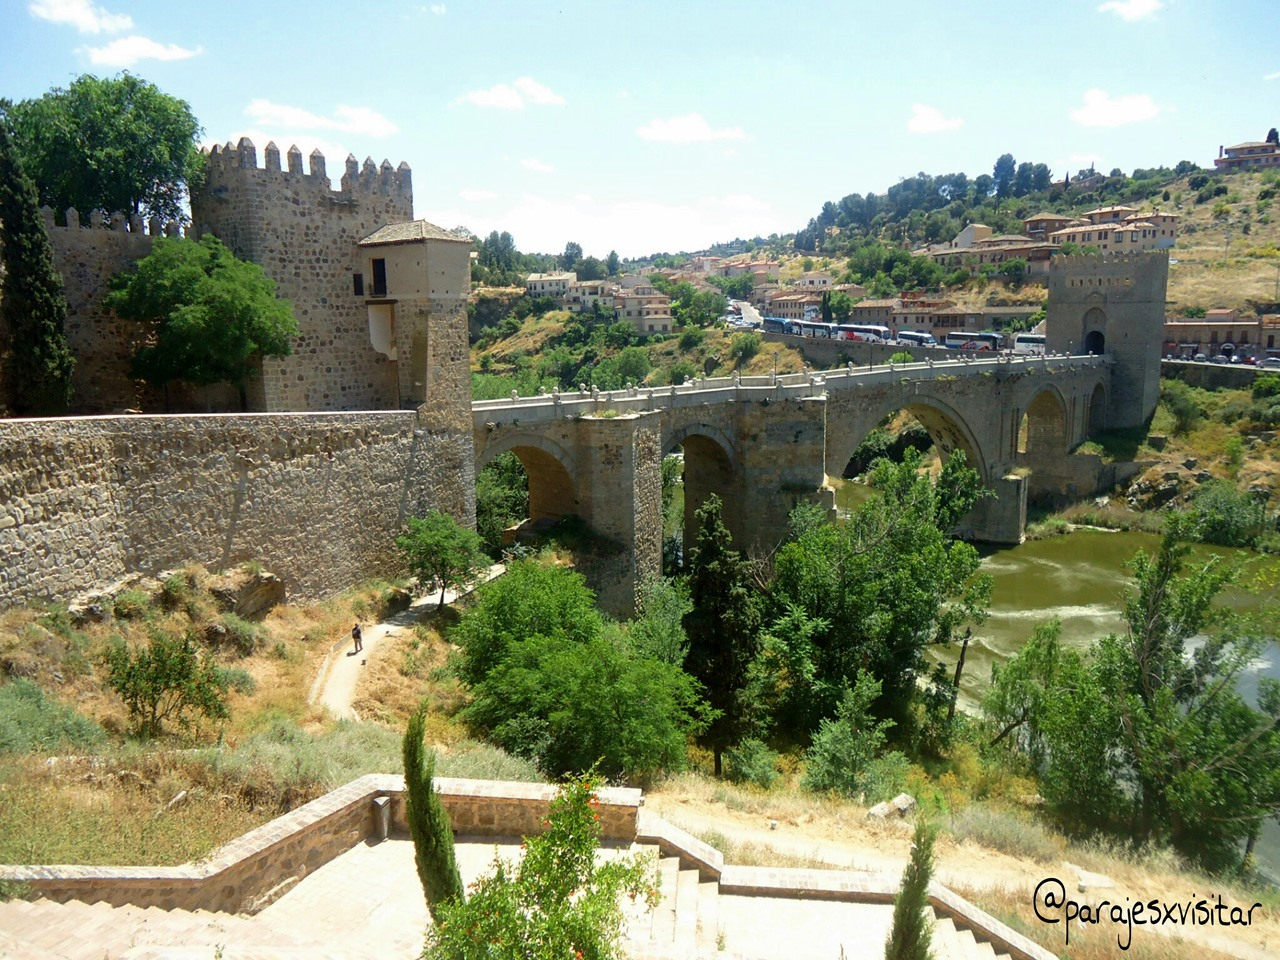 Toledo Tajo Guided tour